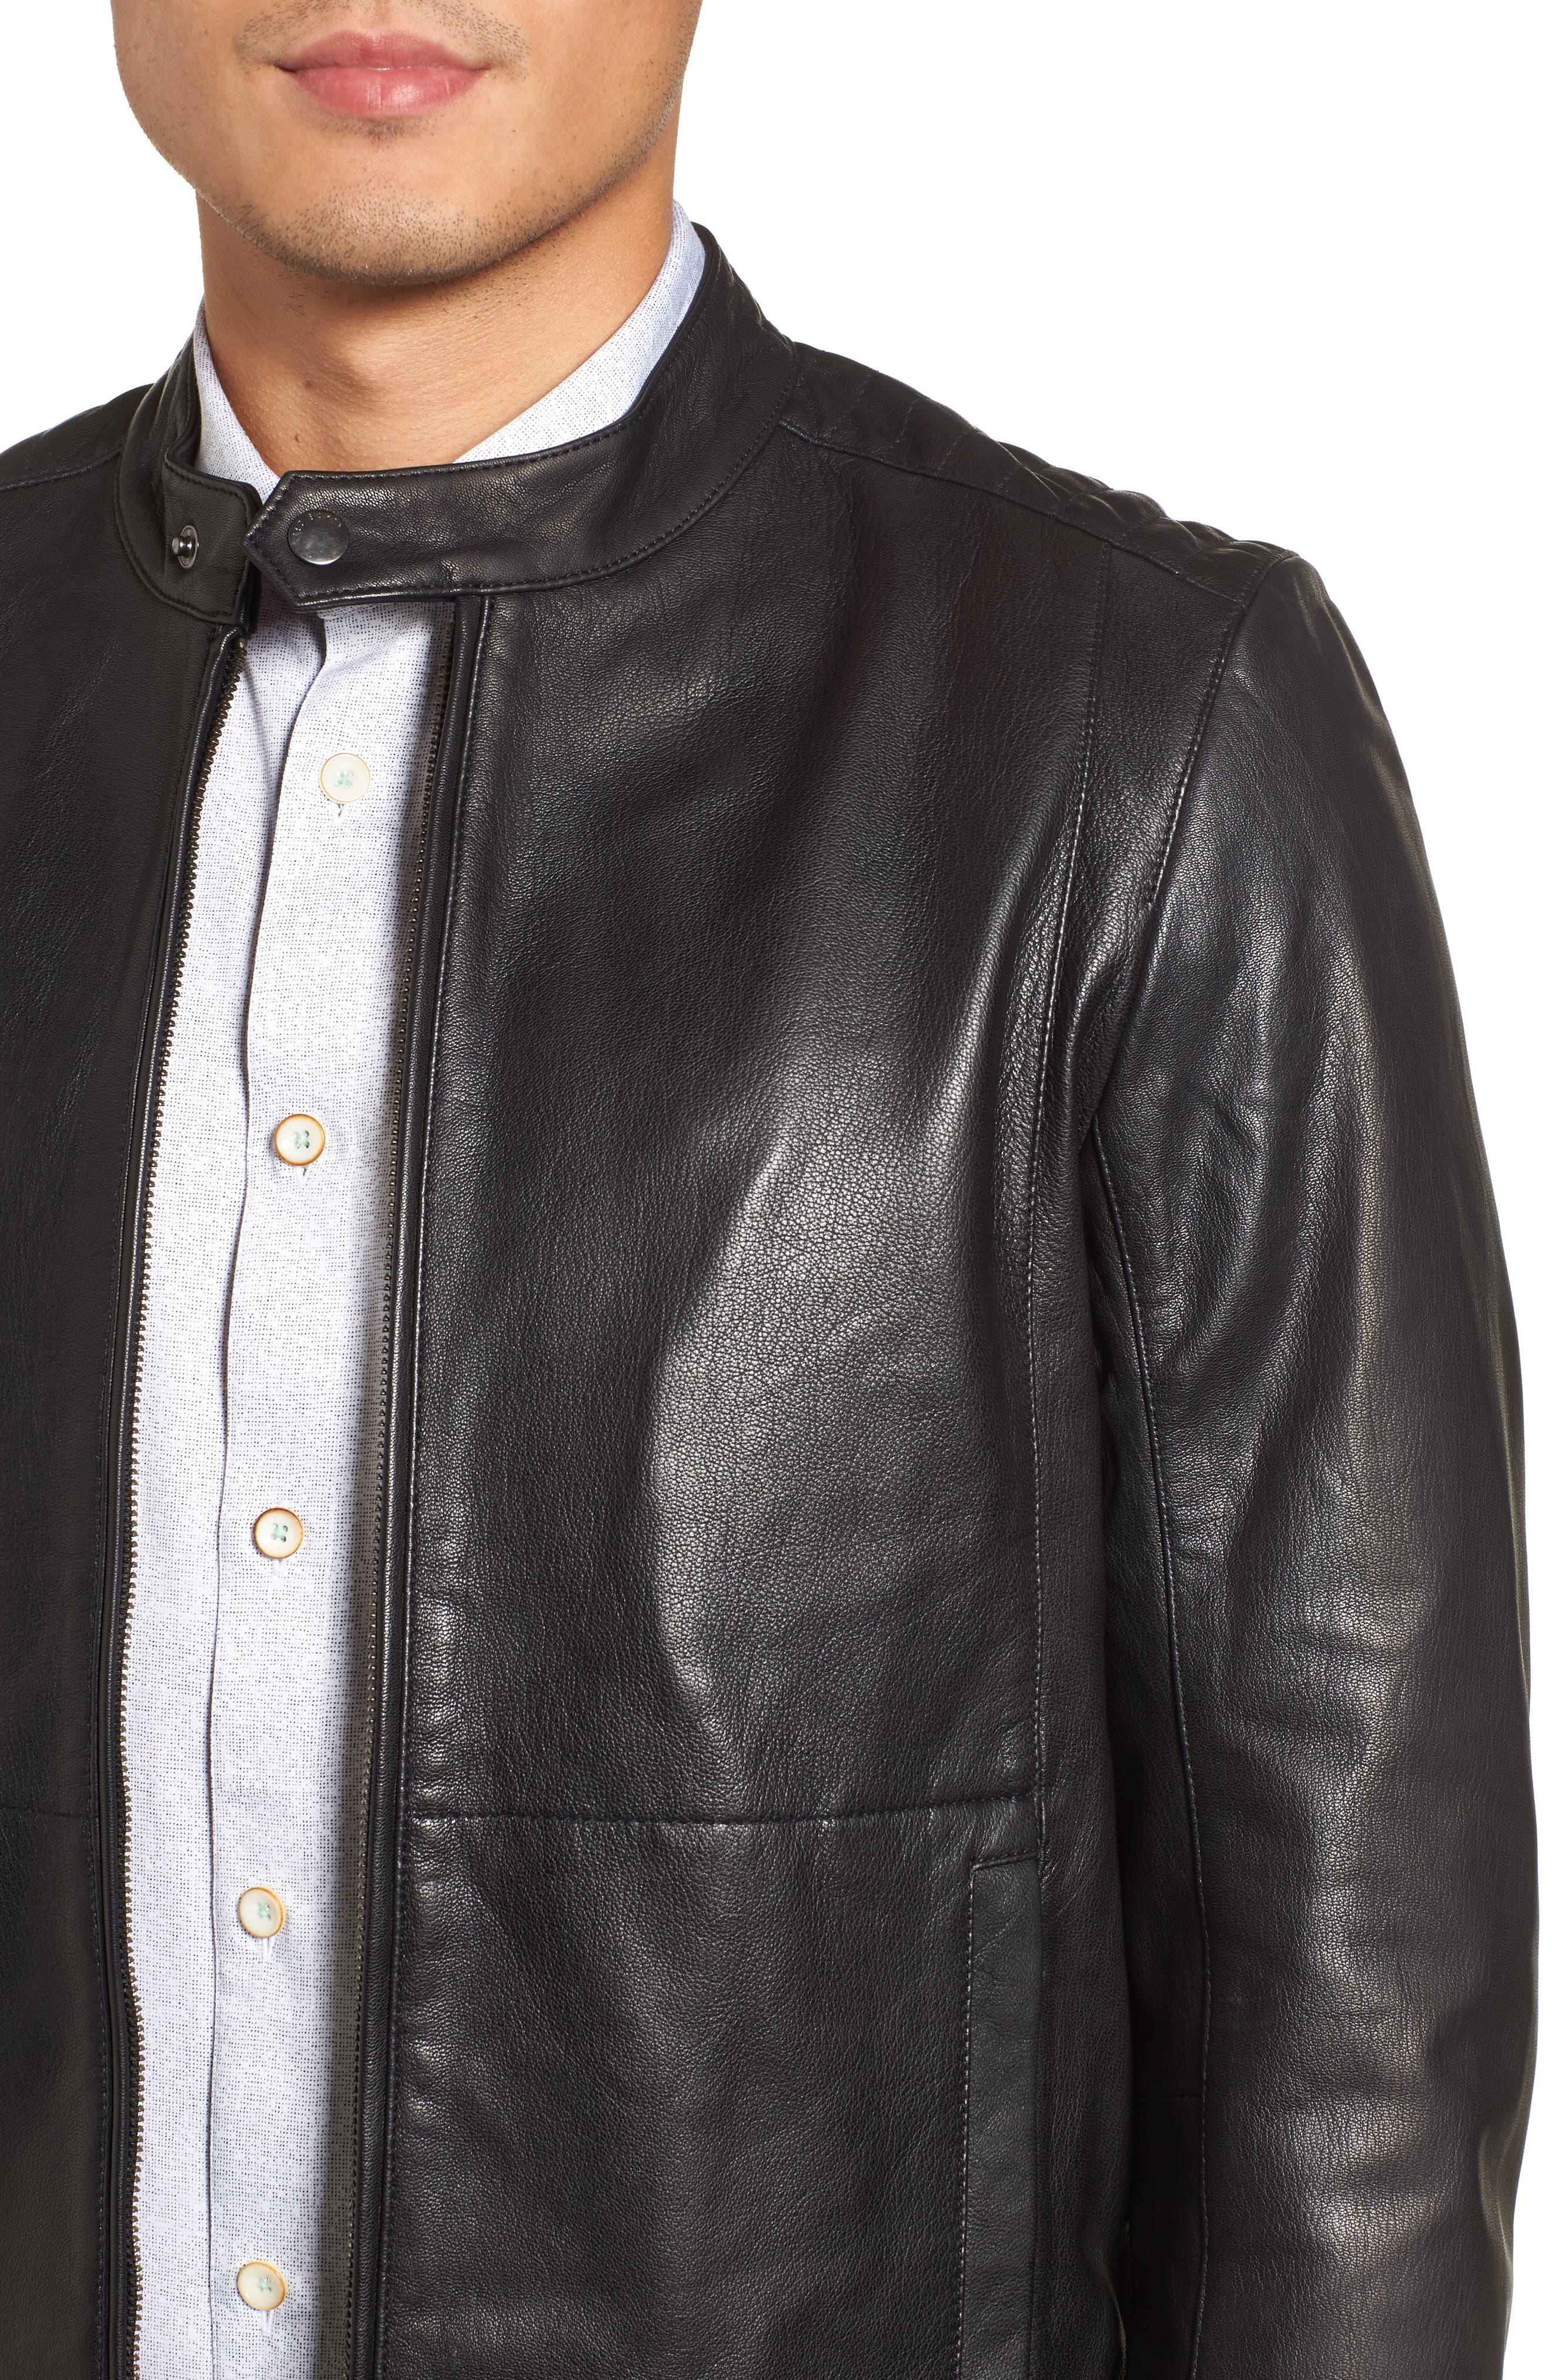 Mate Leather Biker Jacket,                             Alternate thumbnail 4, color,                             001